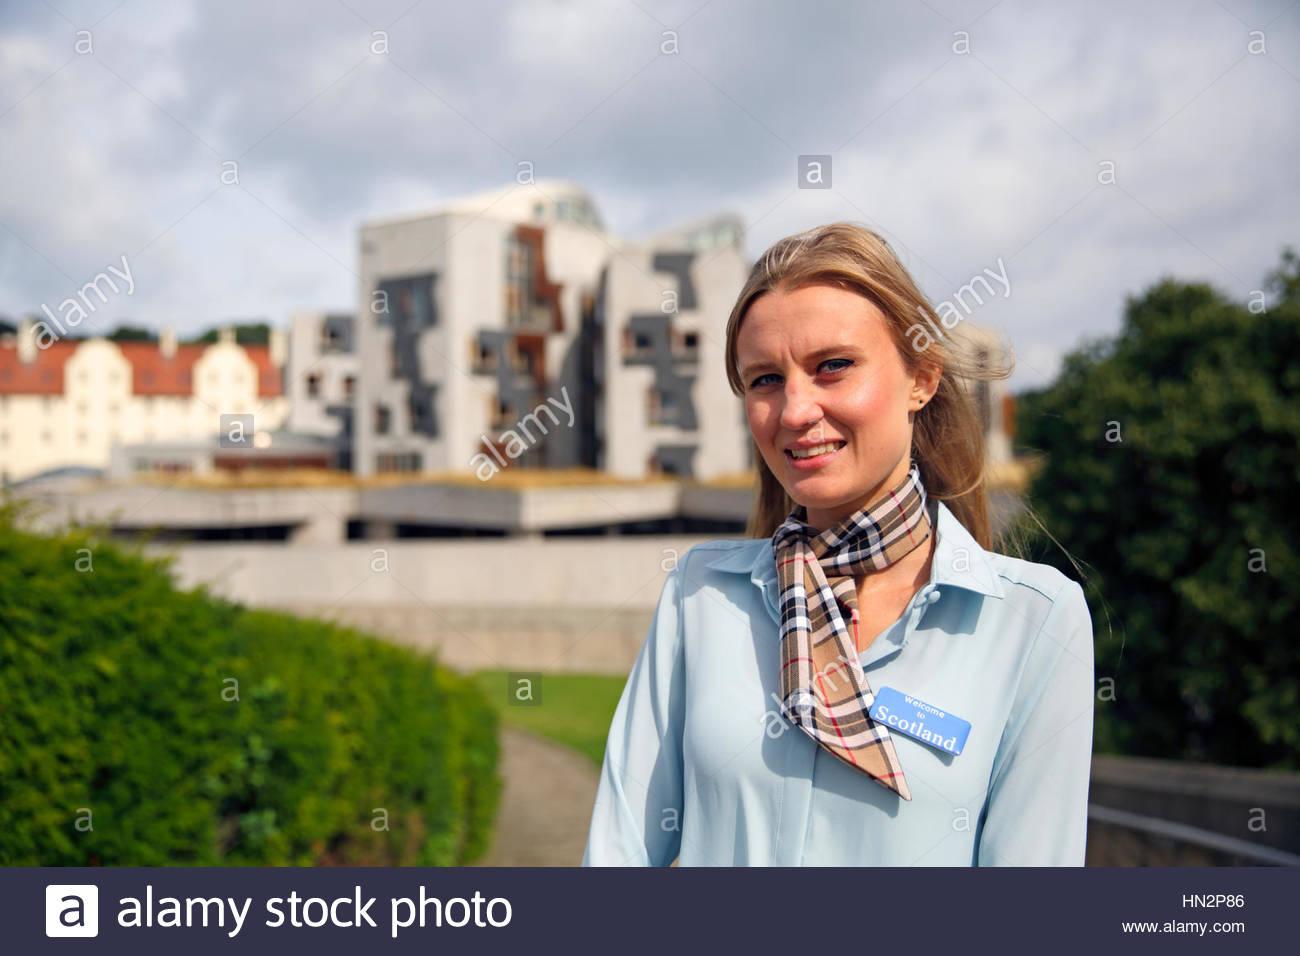 Tour guide at the Scottish parliament in Edinburgh - Stock Image